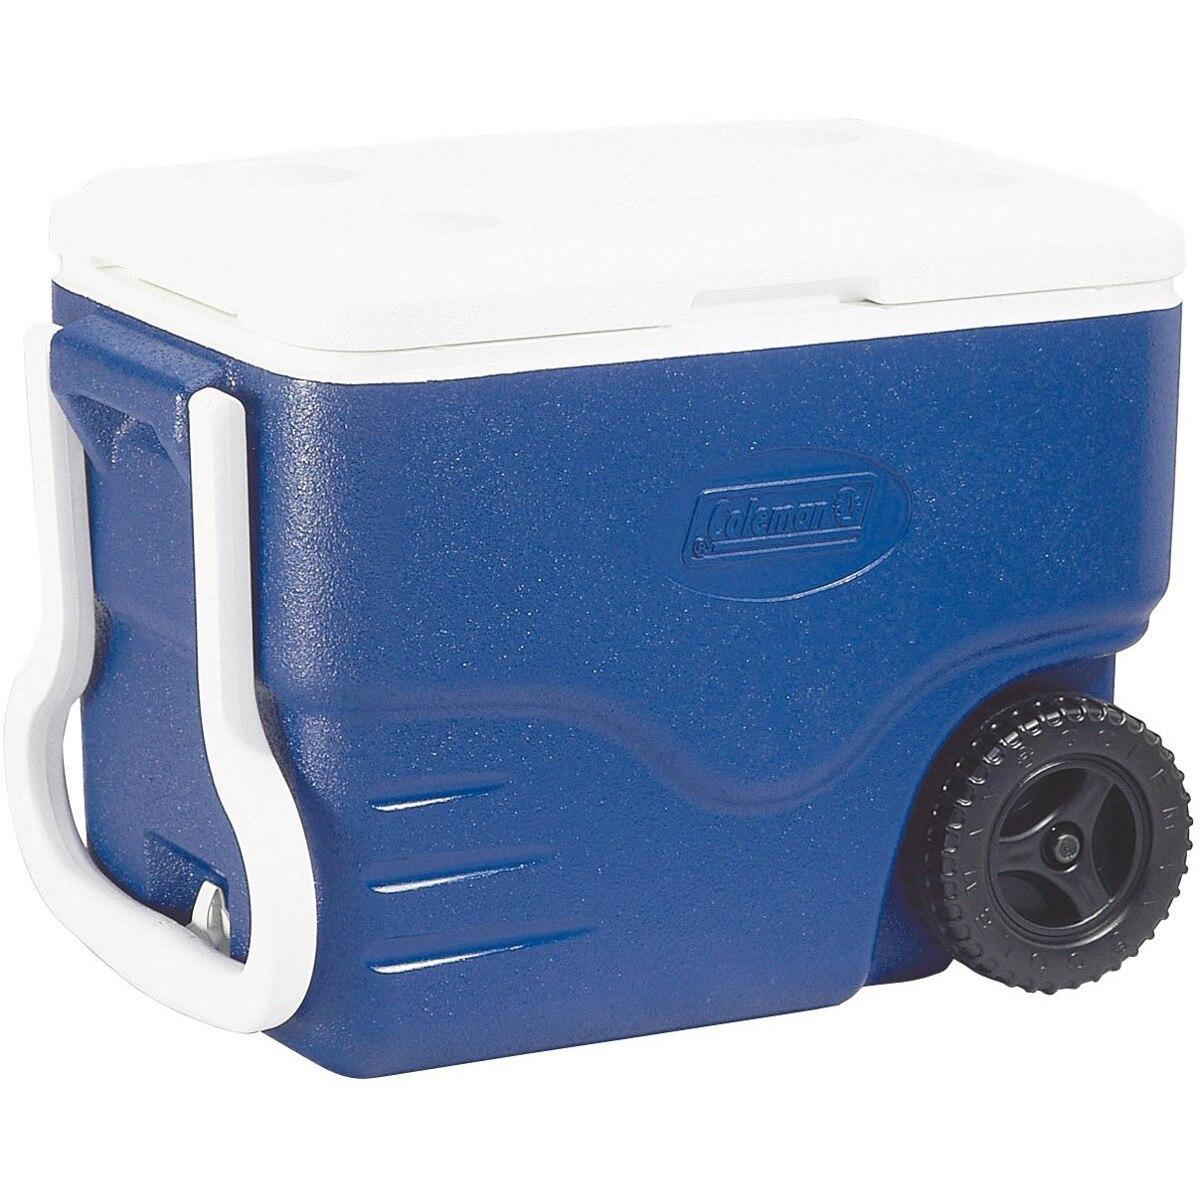 Fotografie Lada frigorifica pasiva Coleman Performance, 37.5 litri, cu roti, albastru